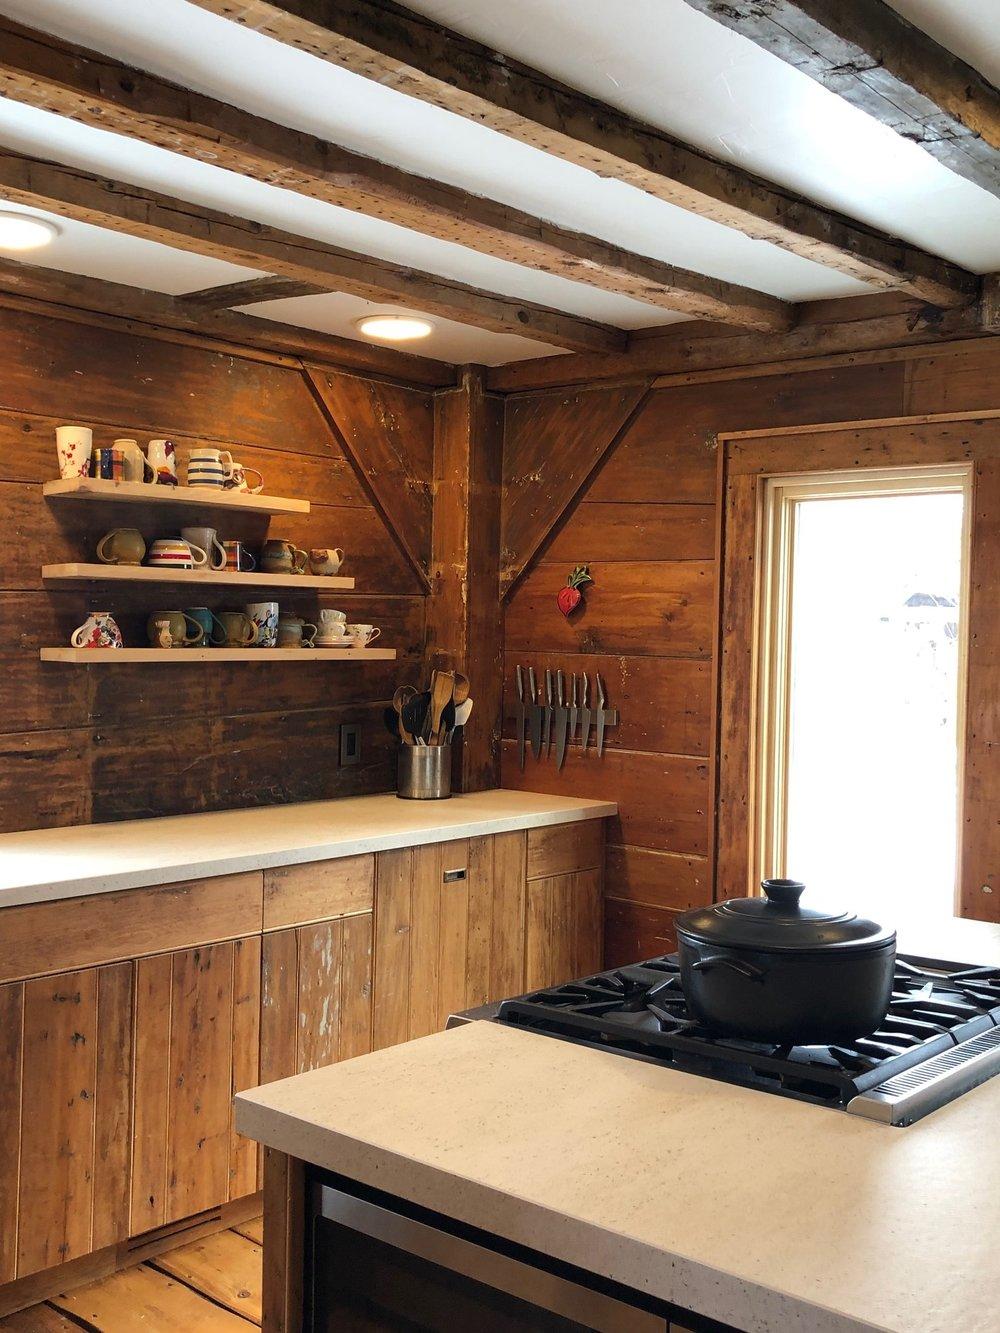 houdinidesign_ARCHITECTS_Mercer-Gordon_Residence_Port_Williams_Annapolis_Valley_Acadian+Kitchen_Renovation_Historical_01.jpg